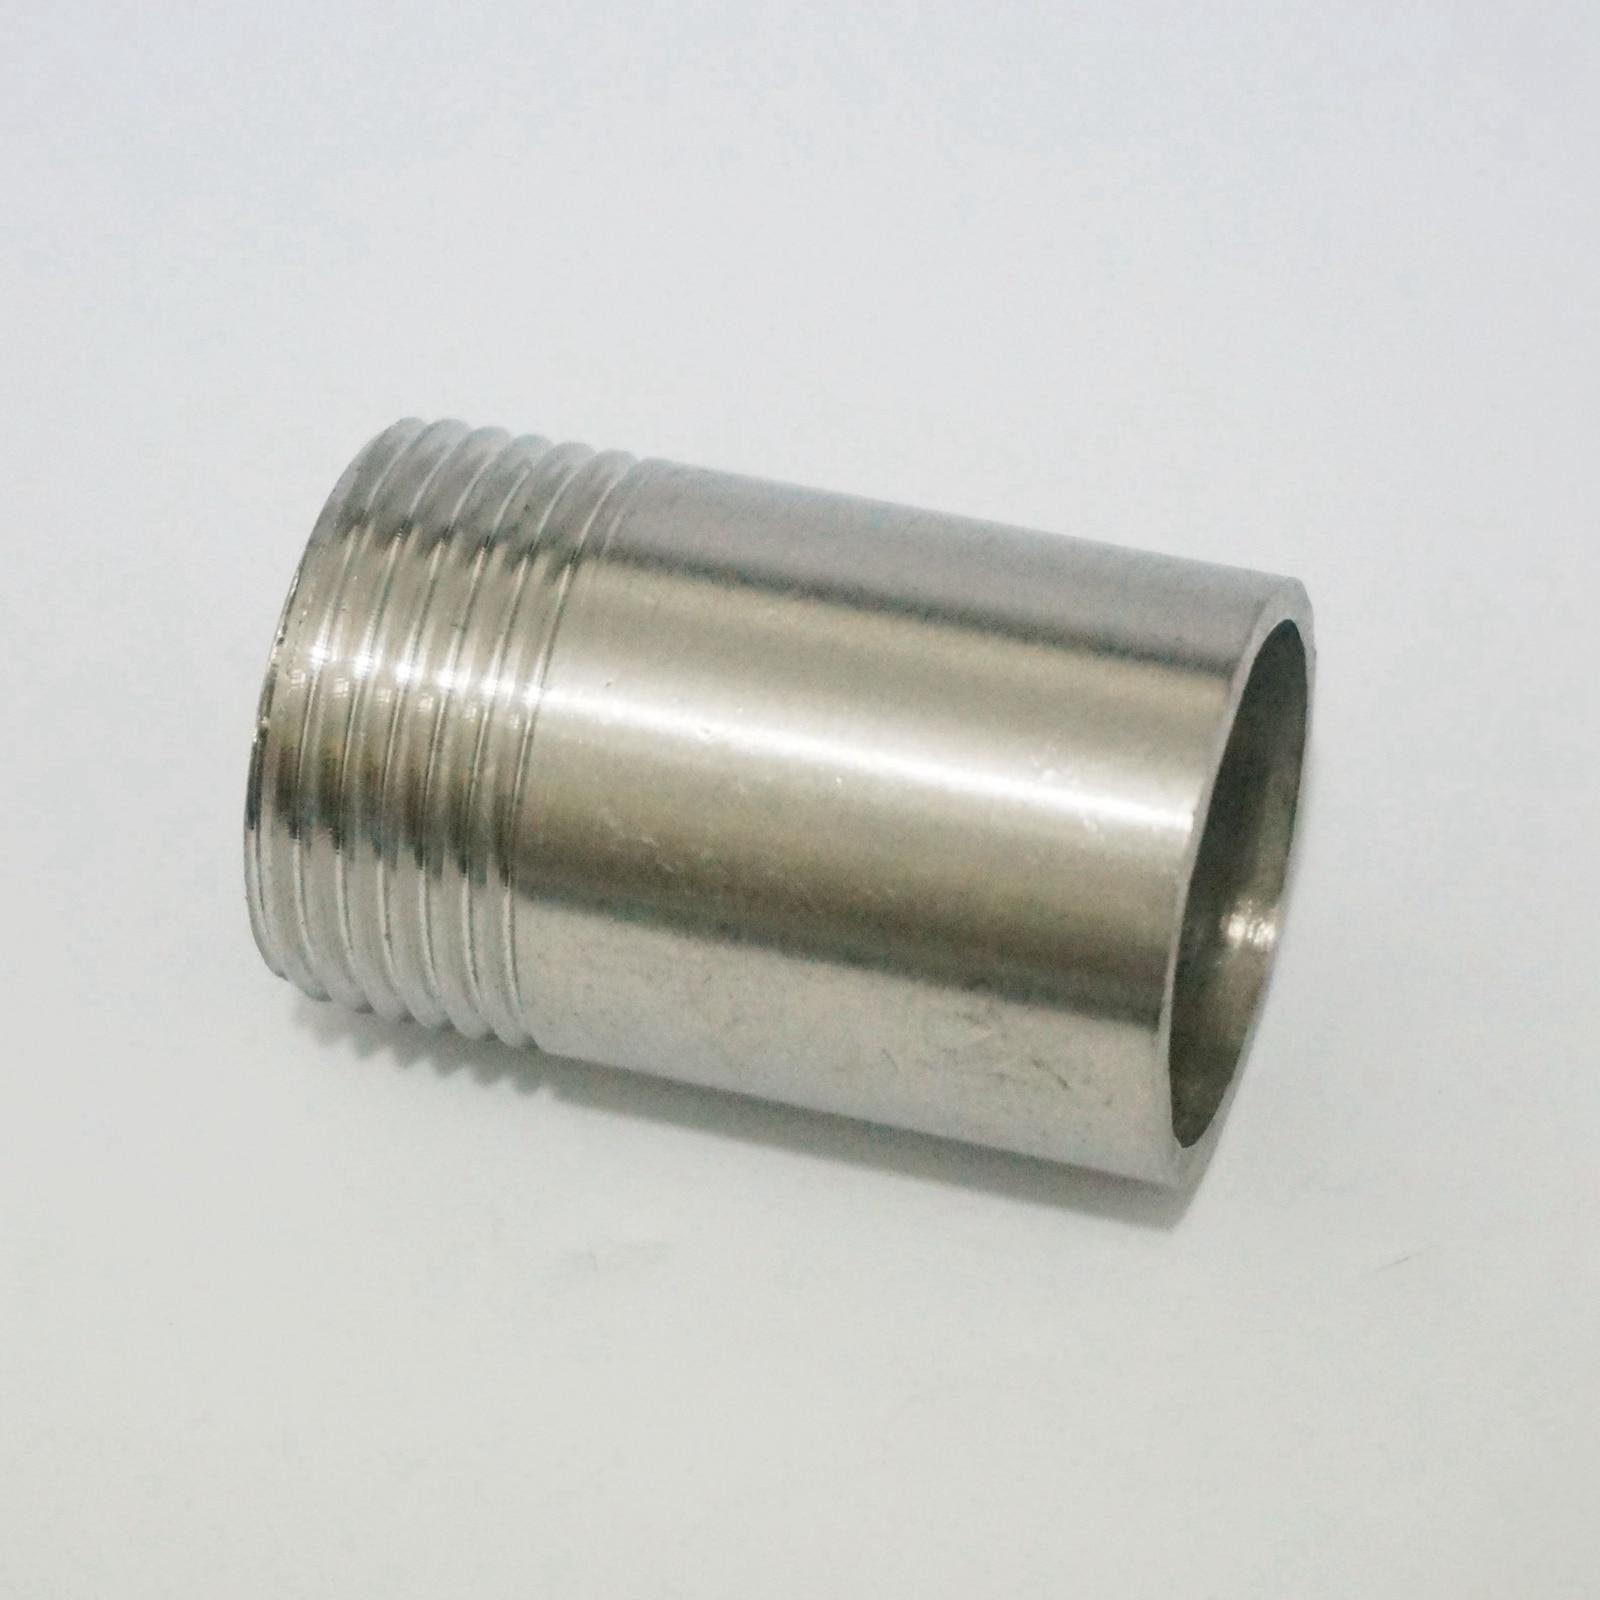 "1/"" BSP Hembra Longitud 100 mm 304 ss Tubo Montaje Conector de Soldadura Pezón agua"